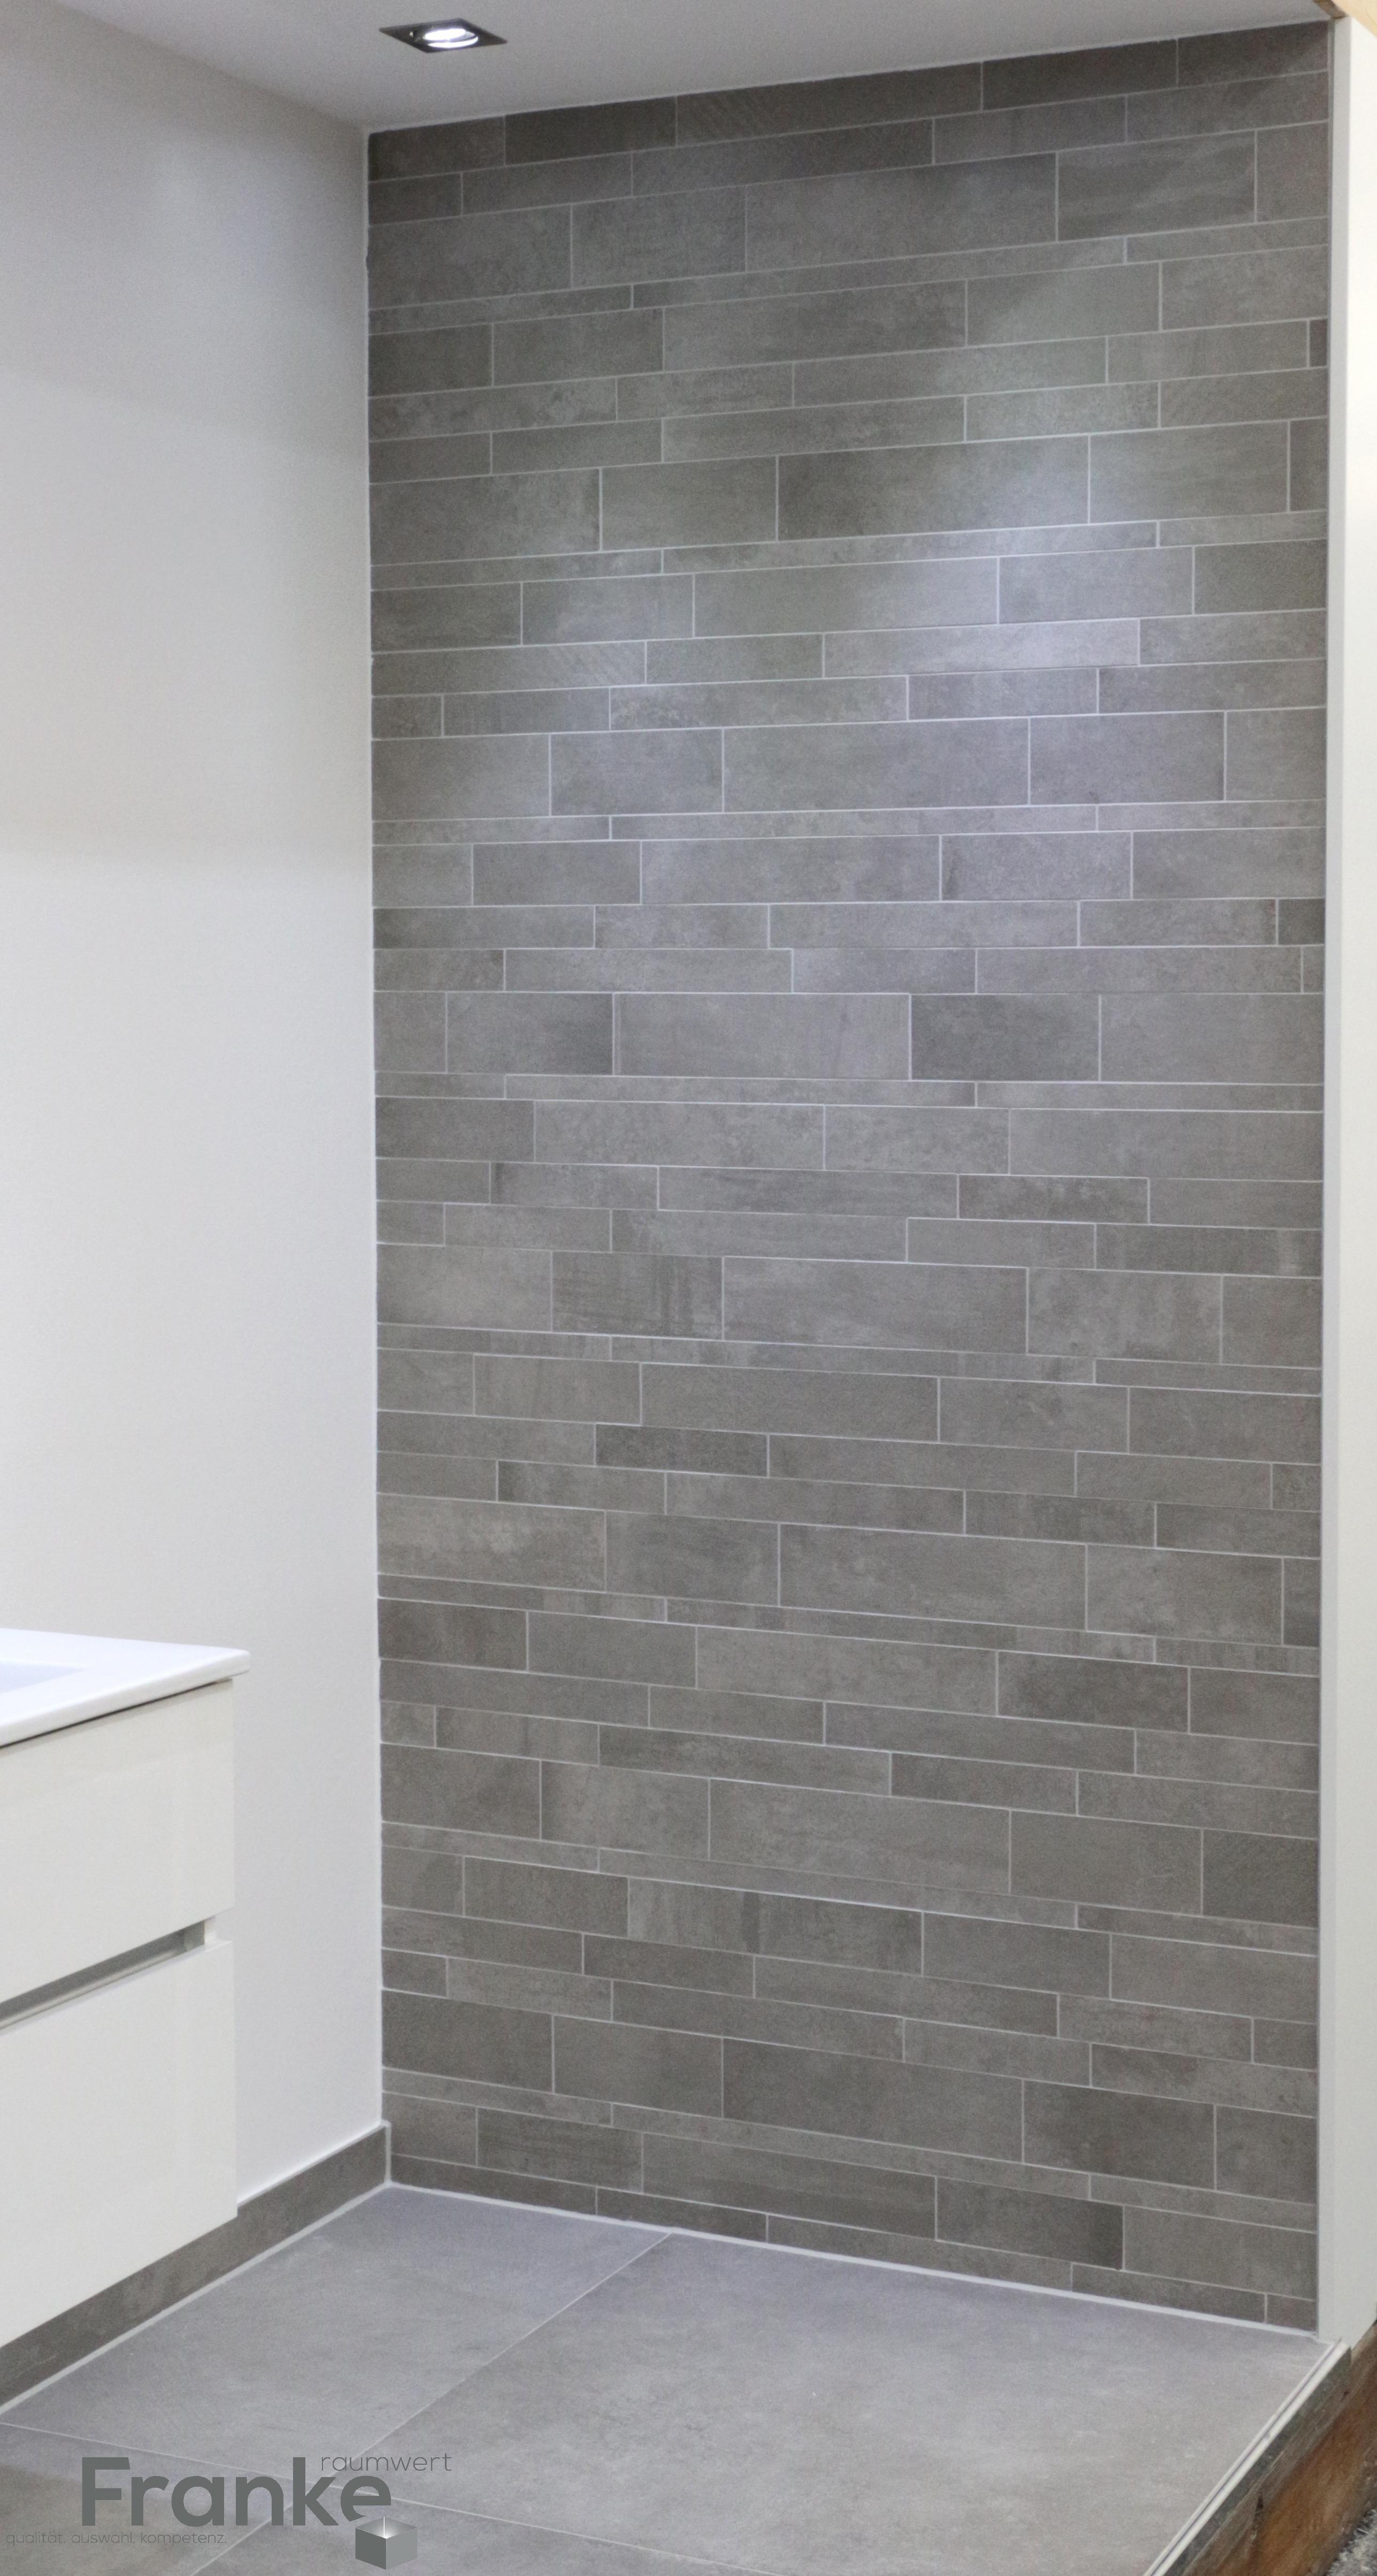 Badezimmer dekor mit fliesen feinsteinzeug dekor in betonoptik im format x dekor great